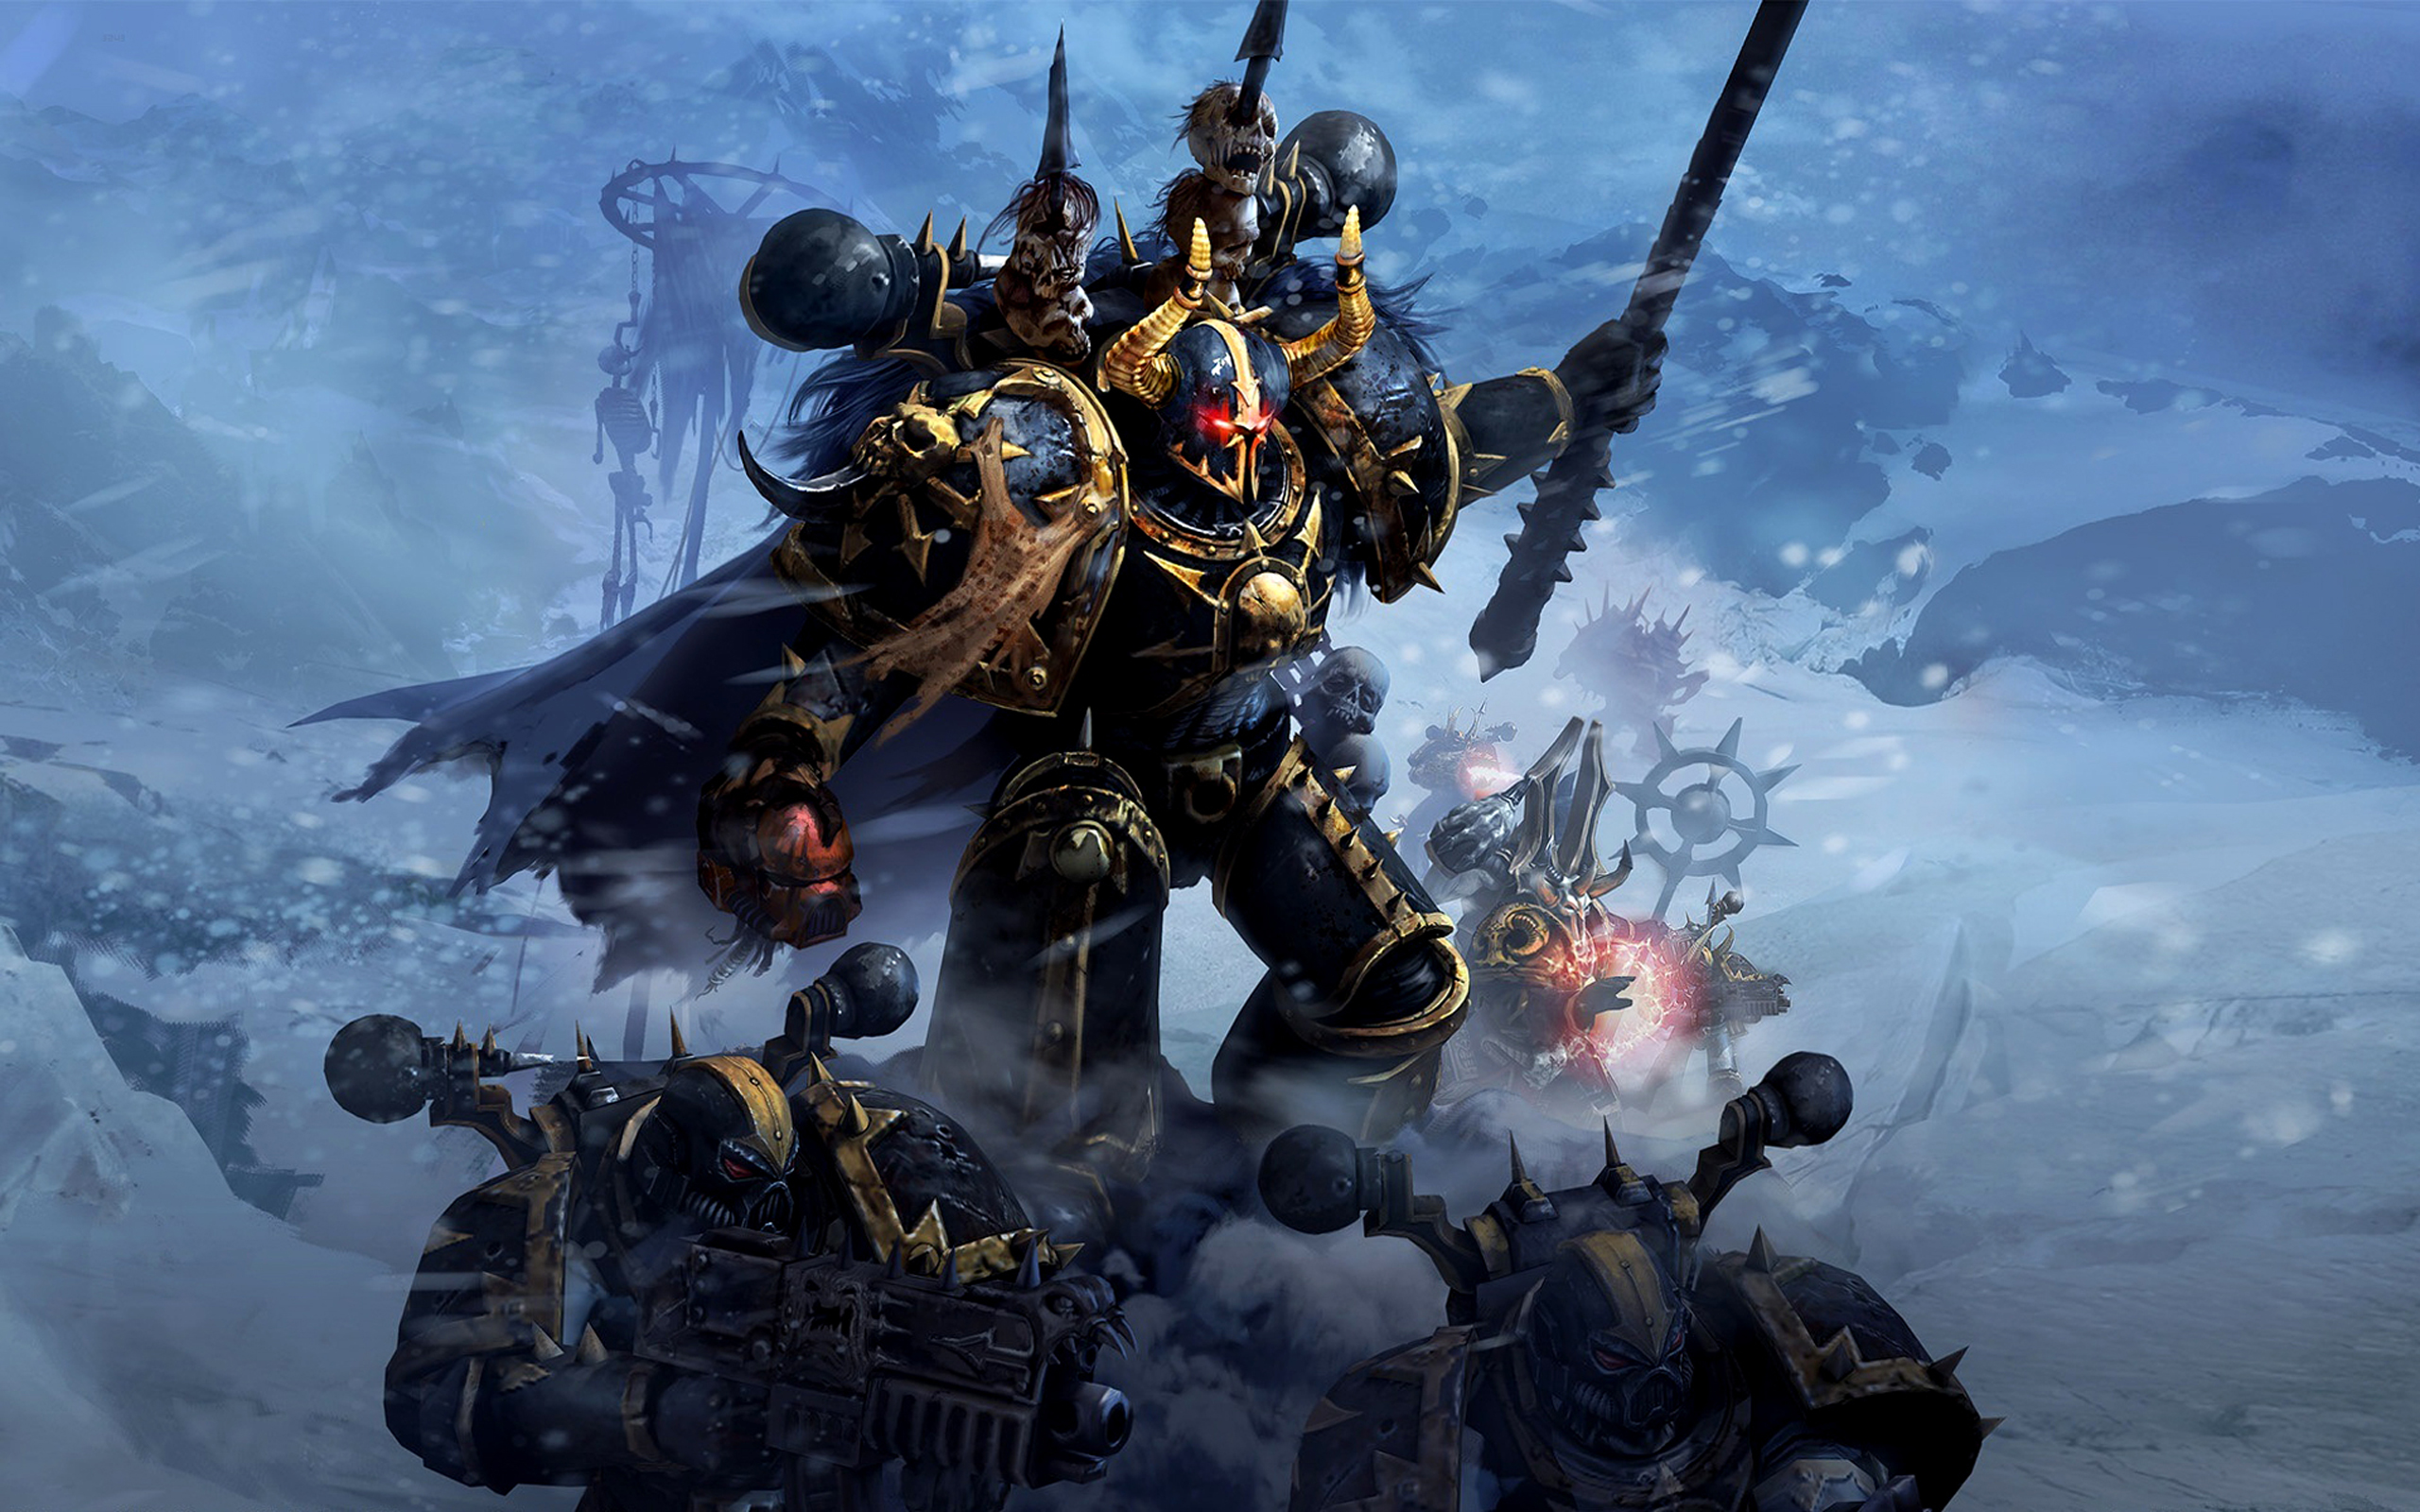 2560x1600 > Warhammer 40K Wallpapers